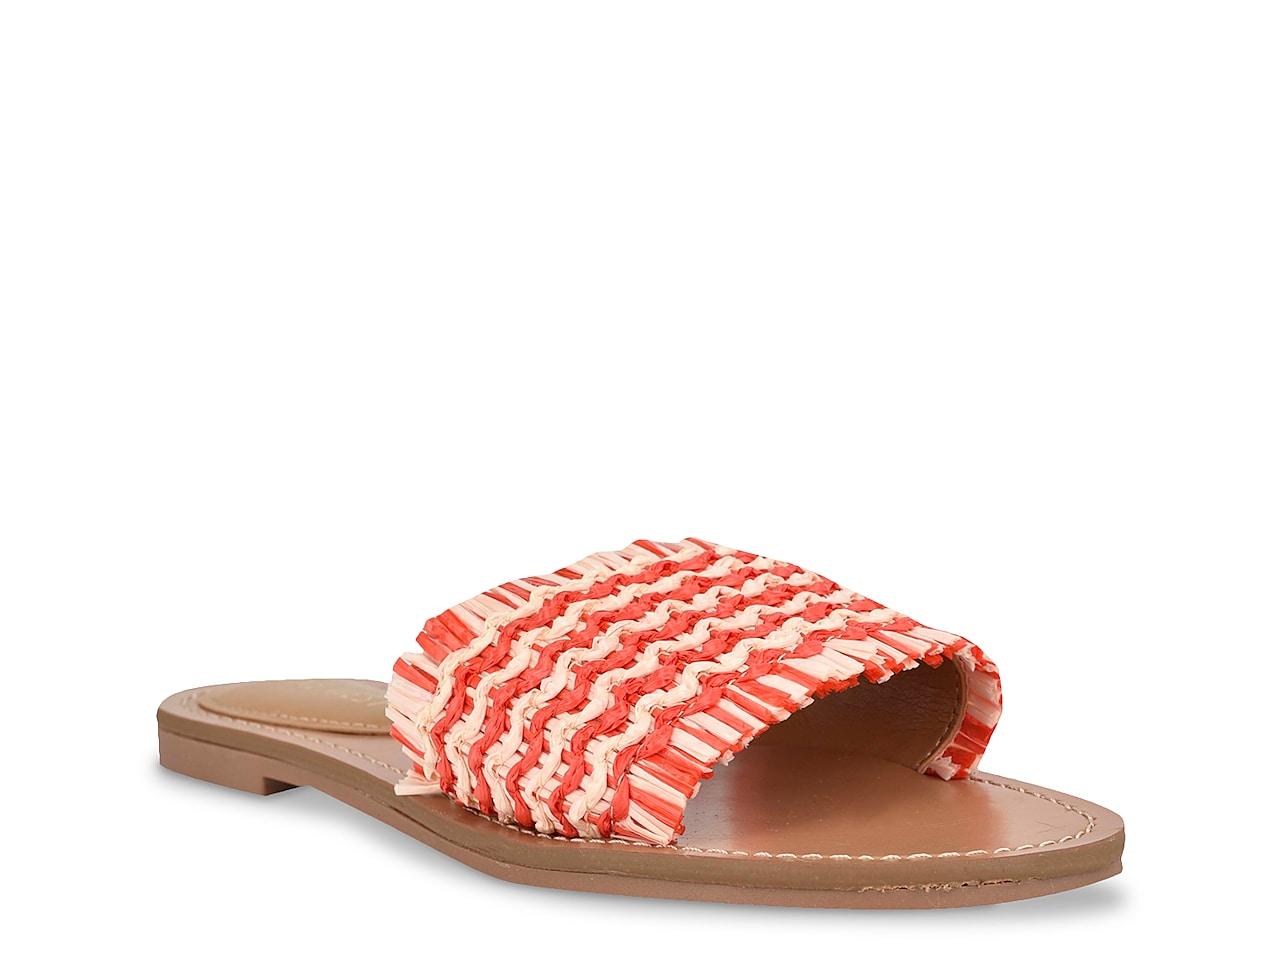 Nine West Cammie 3 Sandal